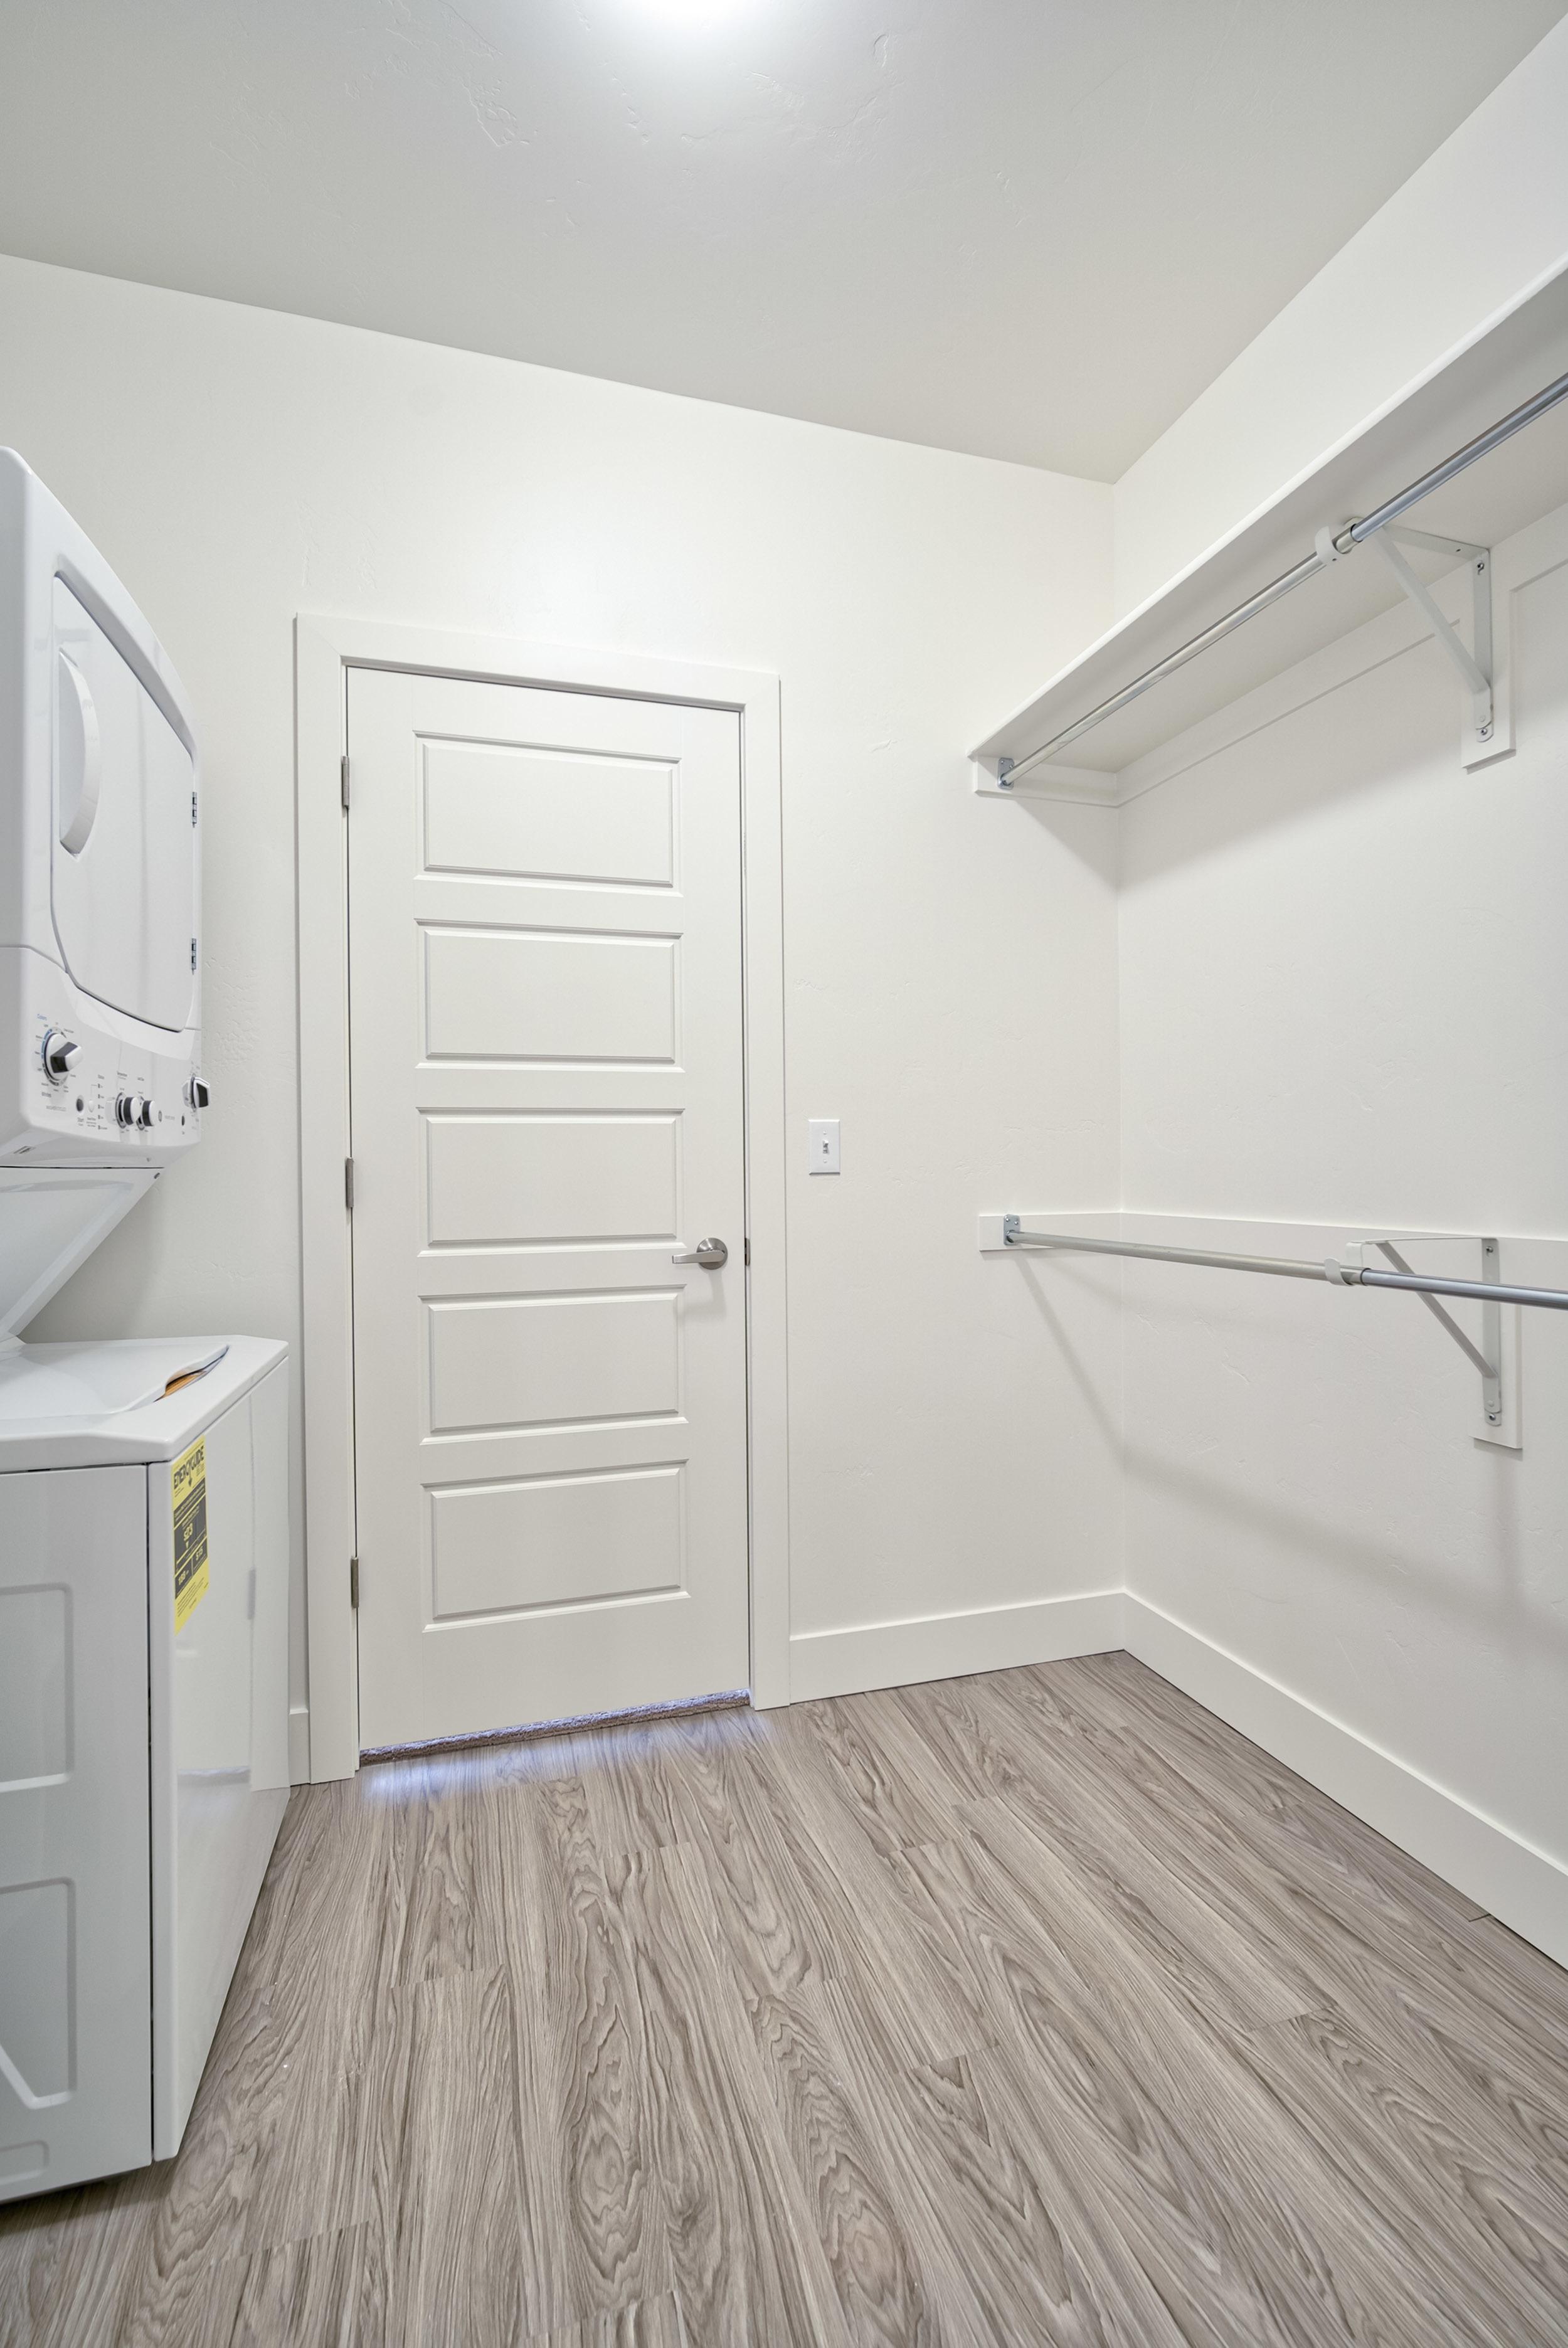 Azalea | 1 Bed Apartment | Eden Apartments | Brand New ...